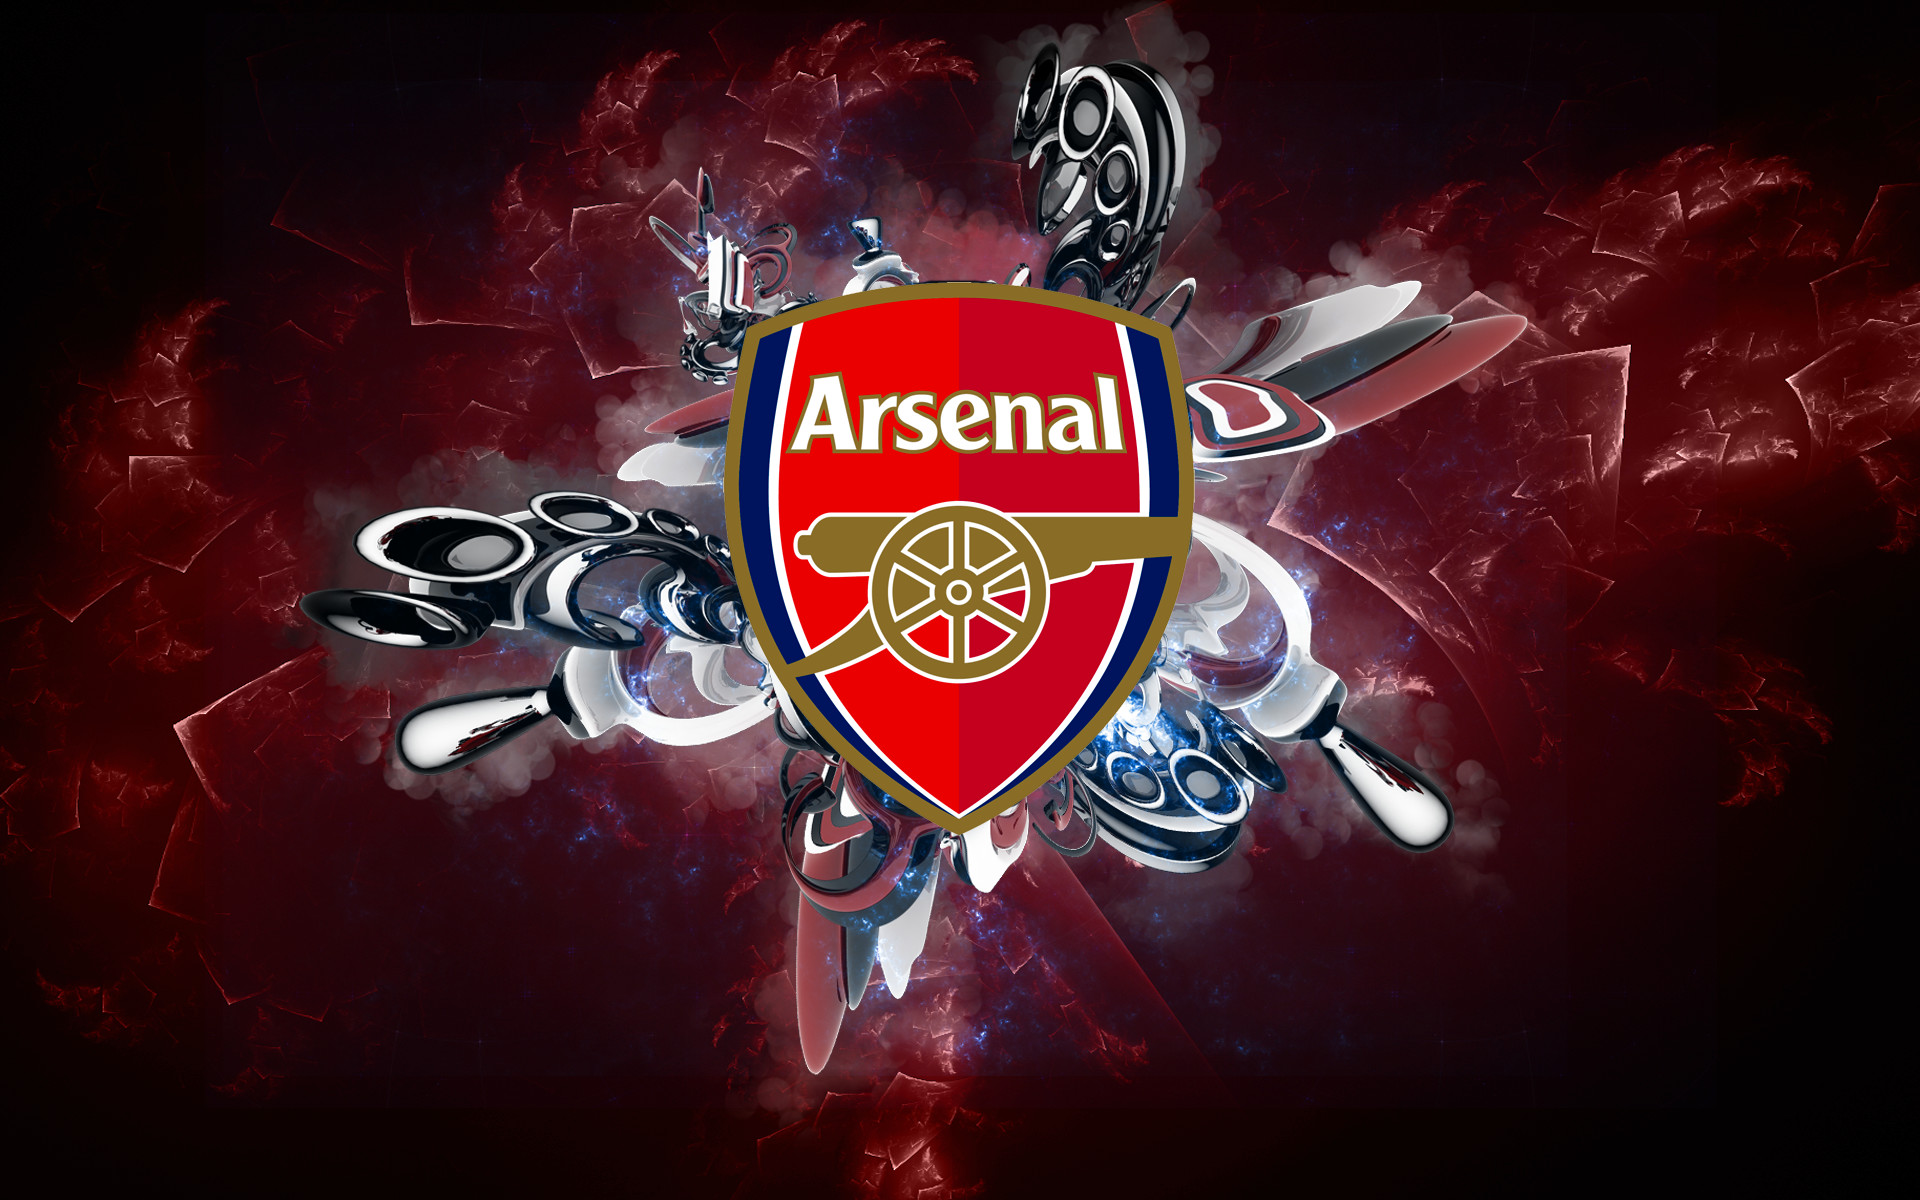 Arsenal-Wallpaper-High-Res-Pics-7296.jpg